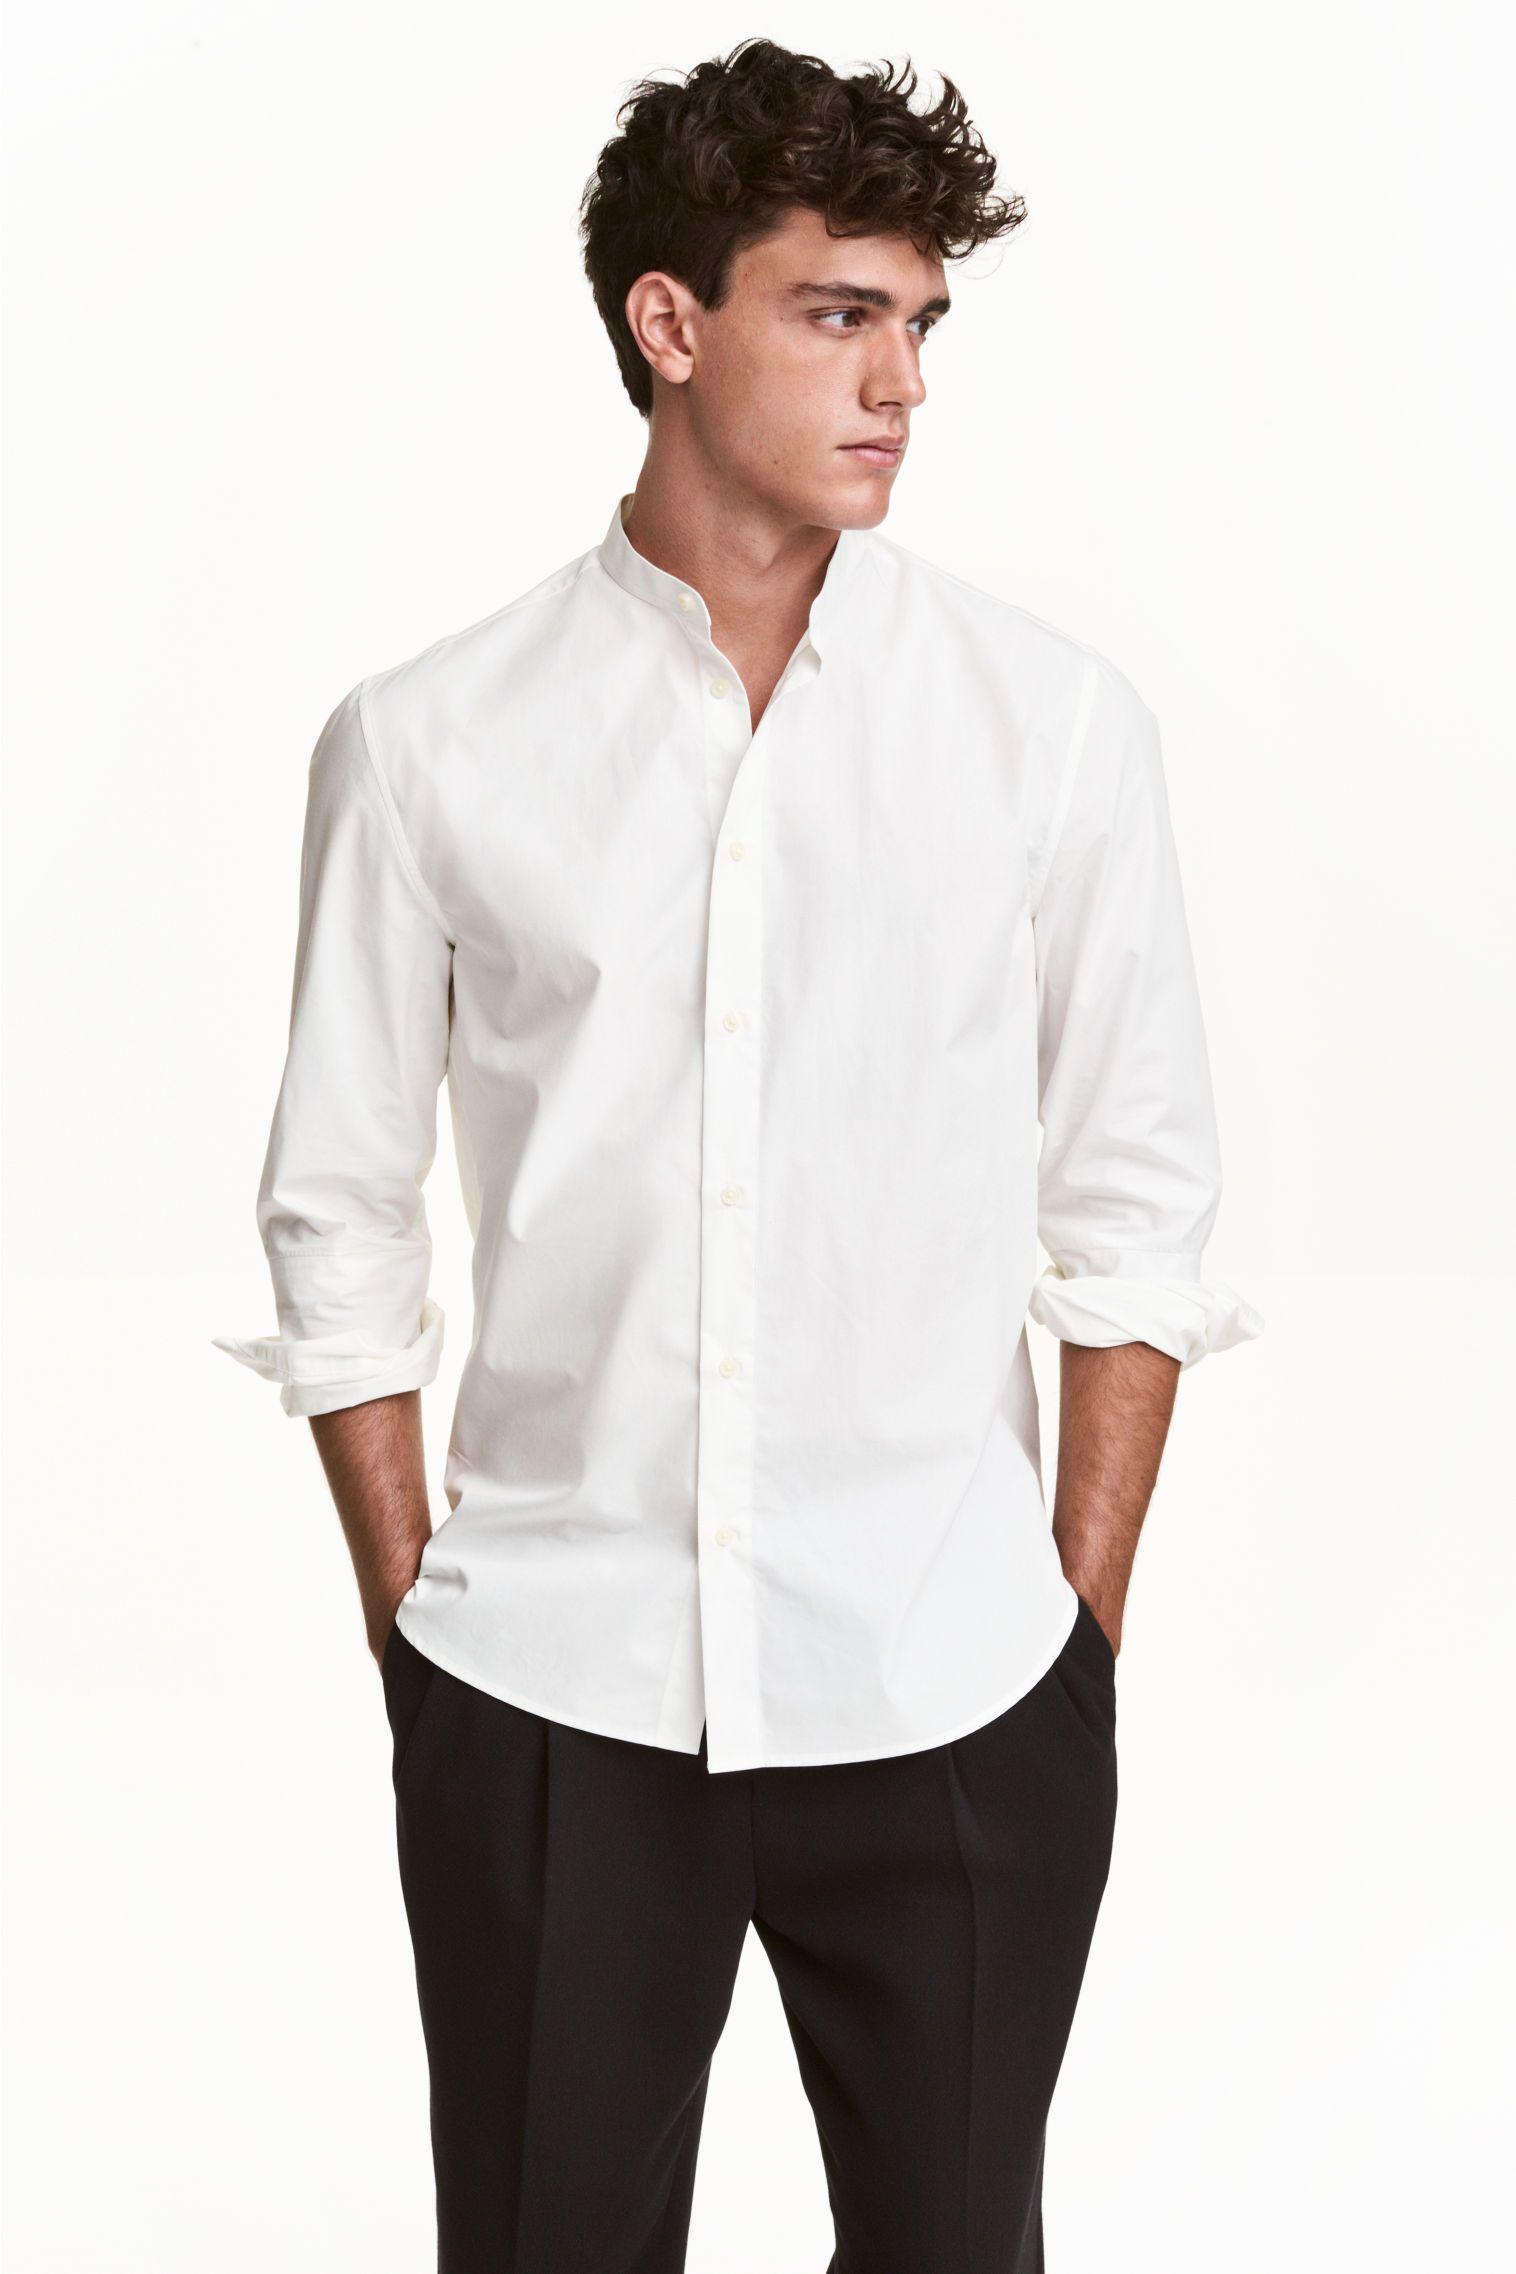 Grandad collar shirt idea